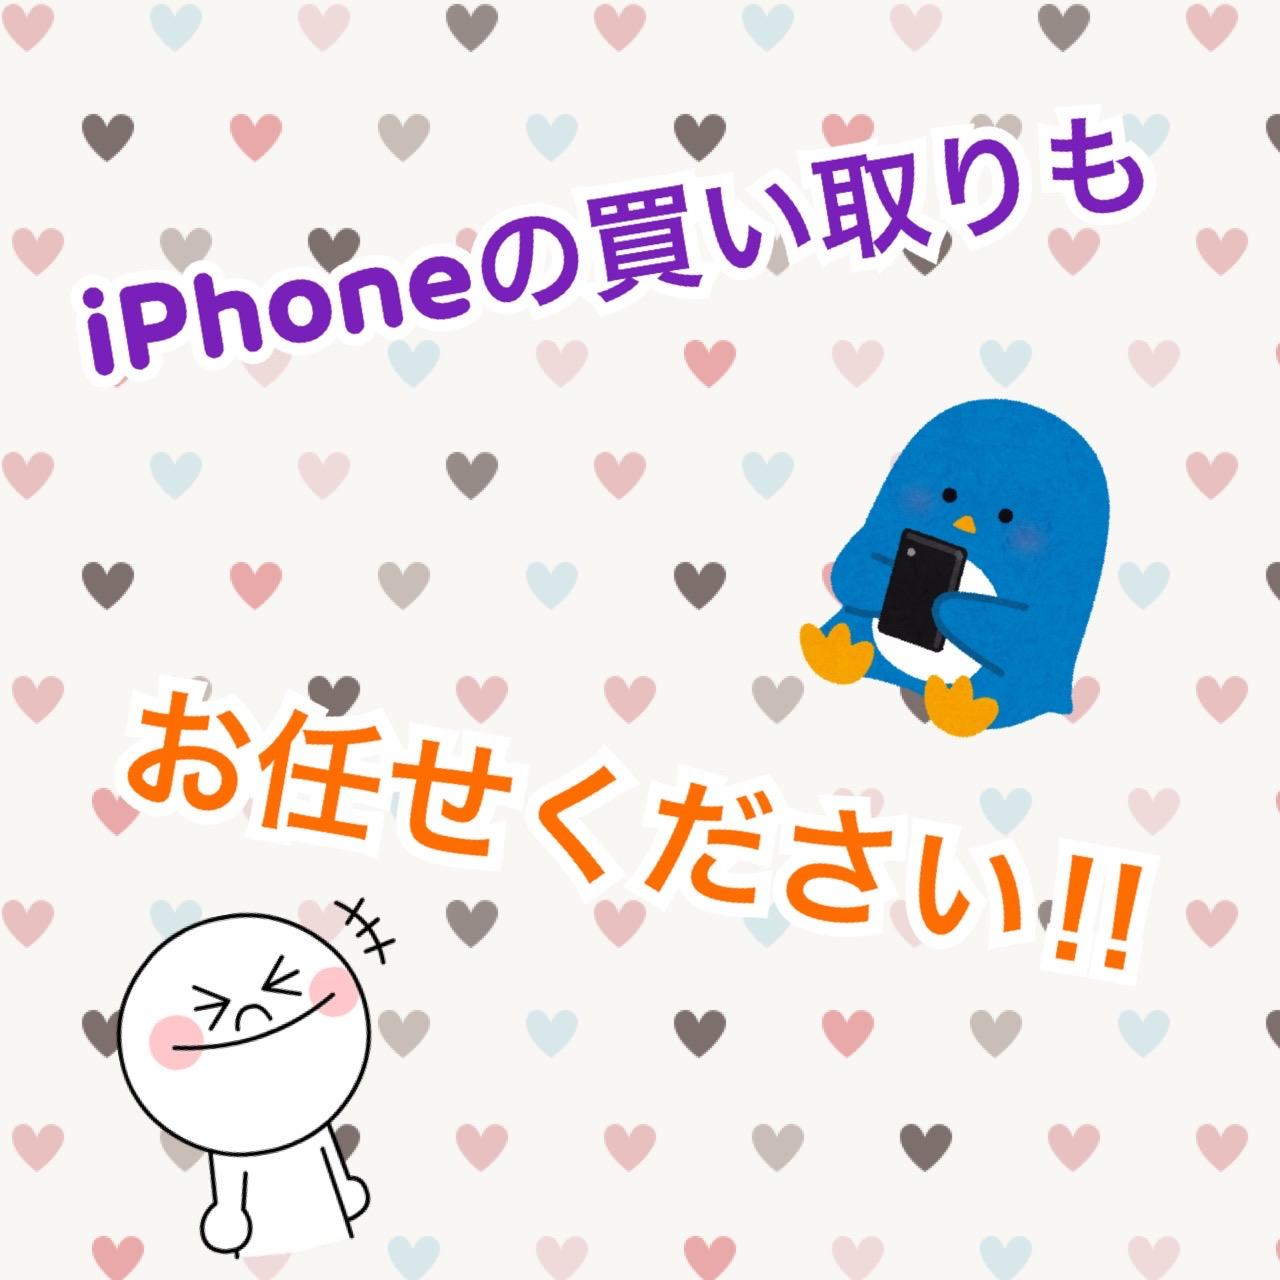 2/1 HEP FIVE店オープン! 2/10 あべのキューズモール店オープン!! 大阪でiPhone修理をするならスマートクールをご利用下さい(^^)/